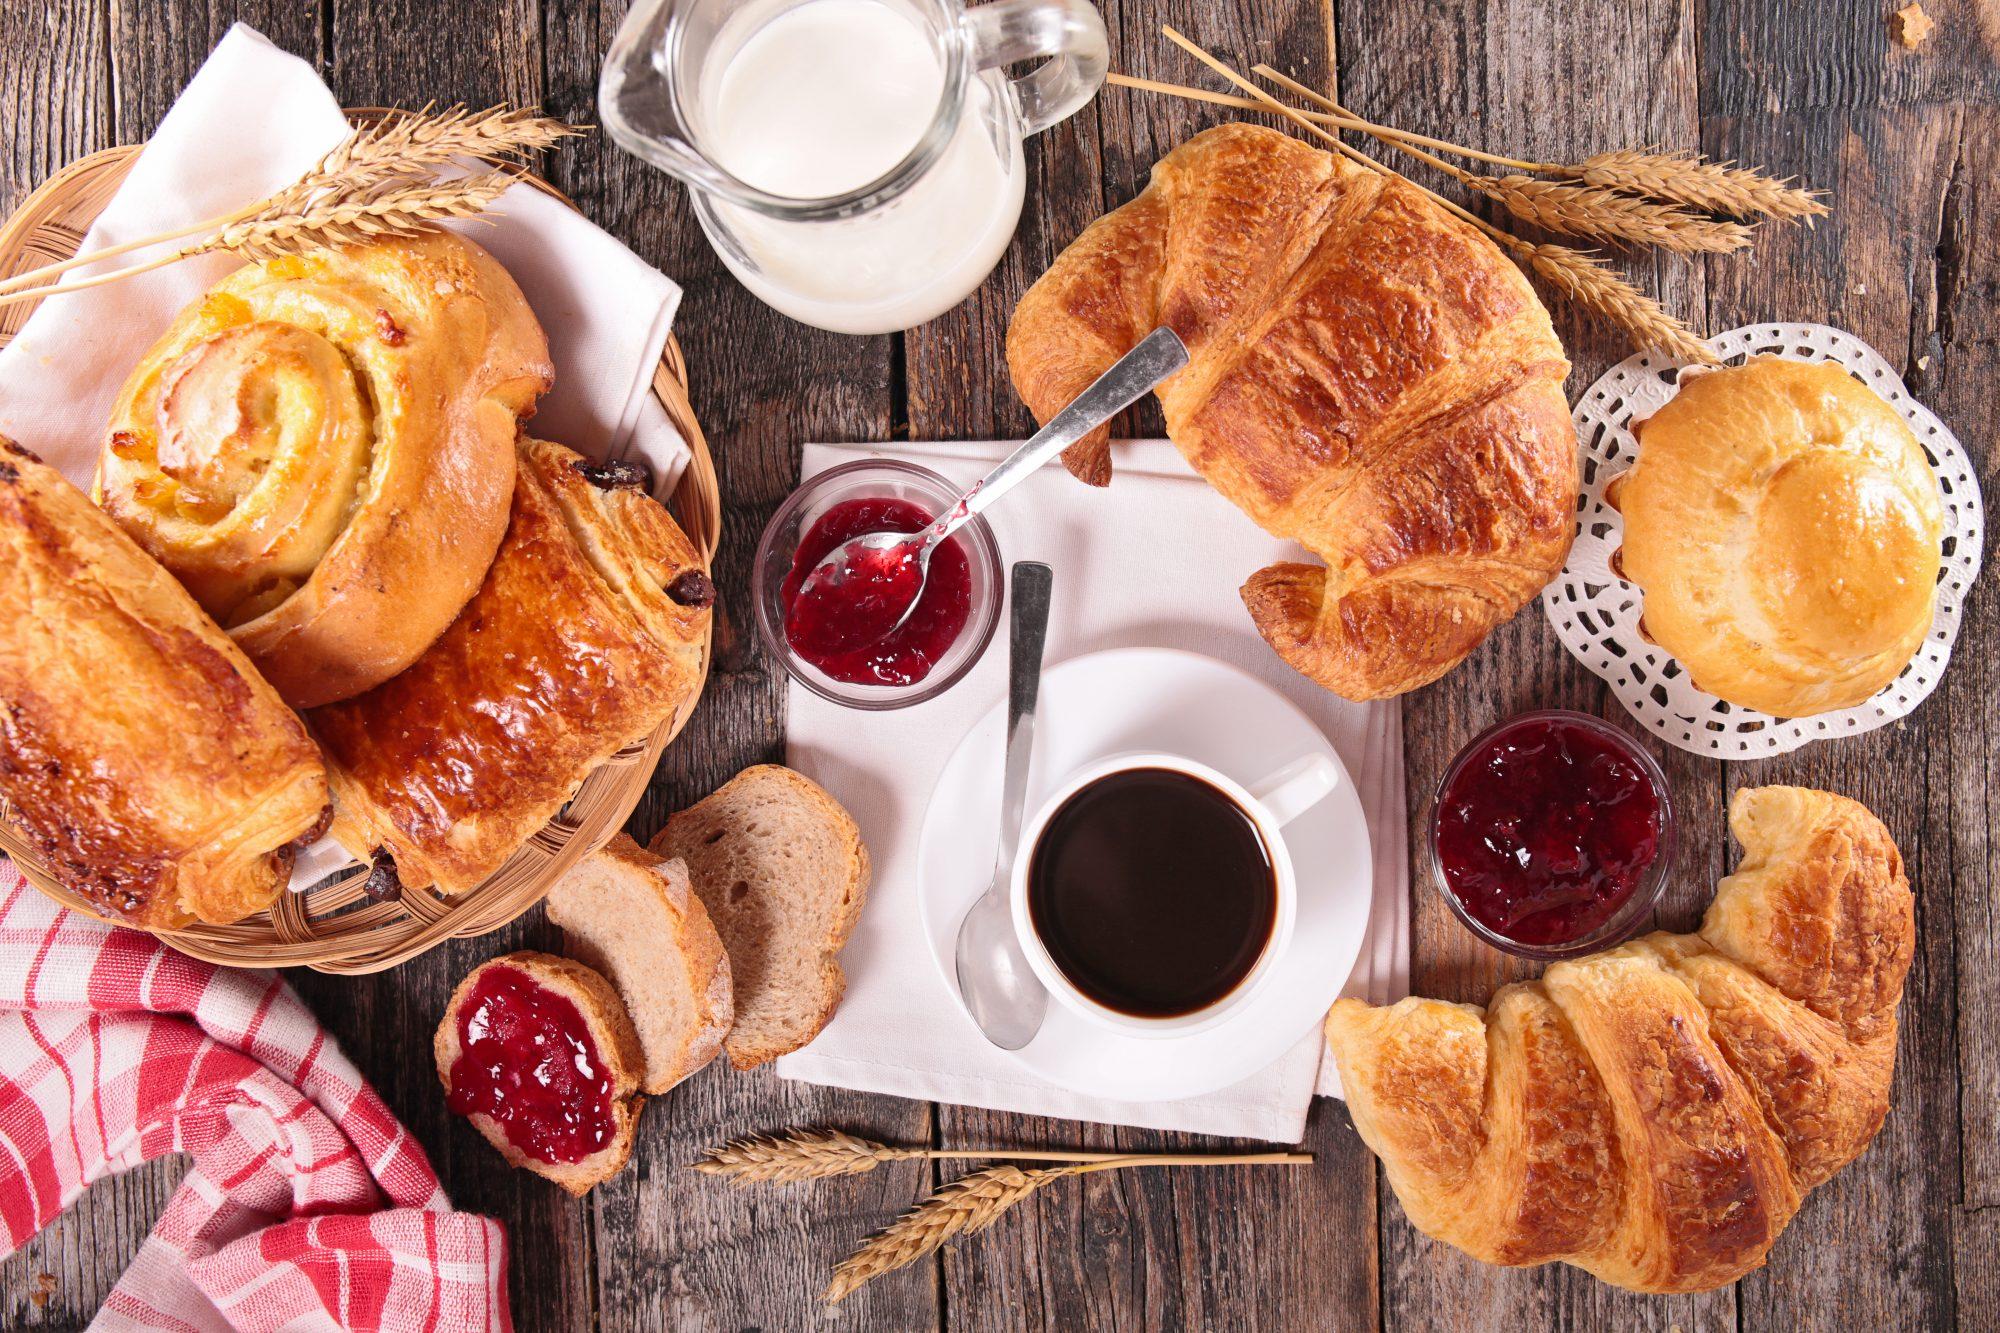 getty-breakfast-pastry-image